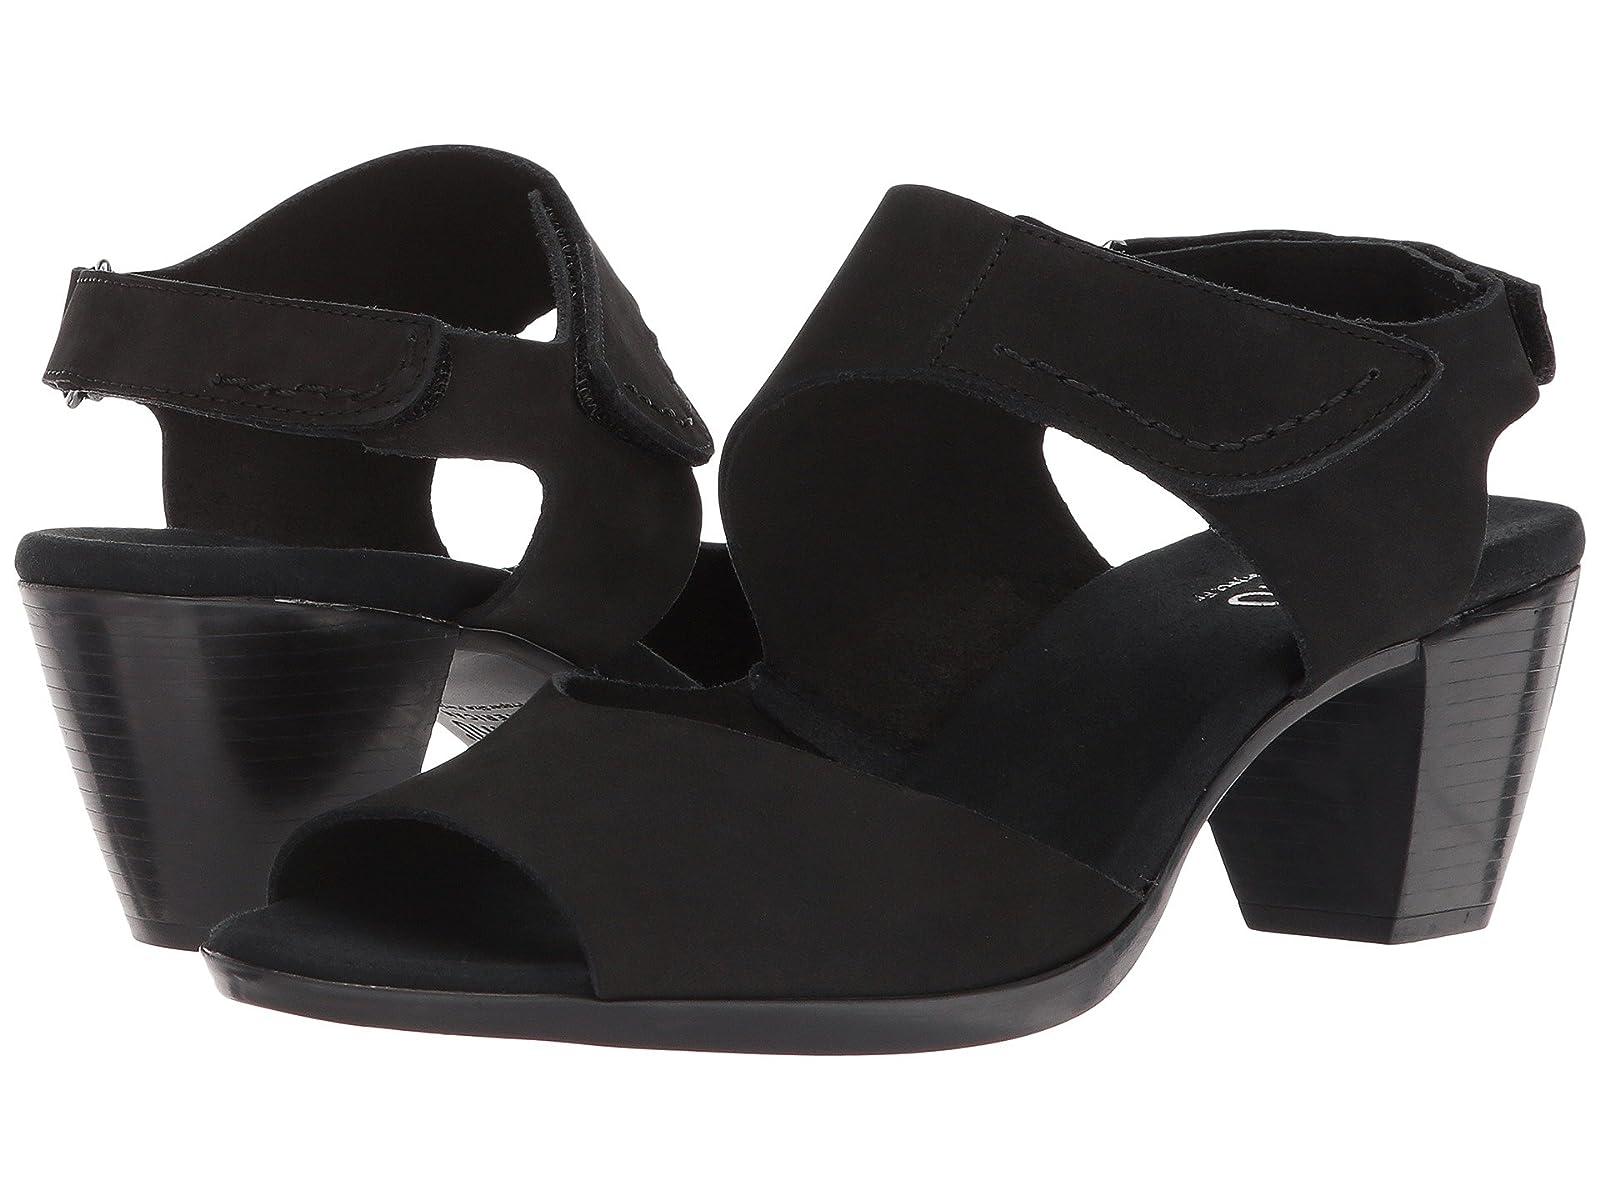 Munro FabianaAtmospheric grades have affordable shoes